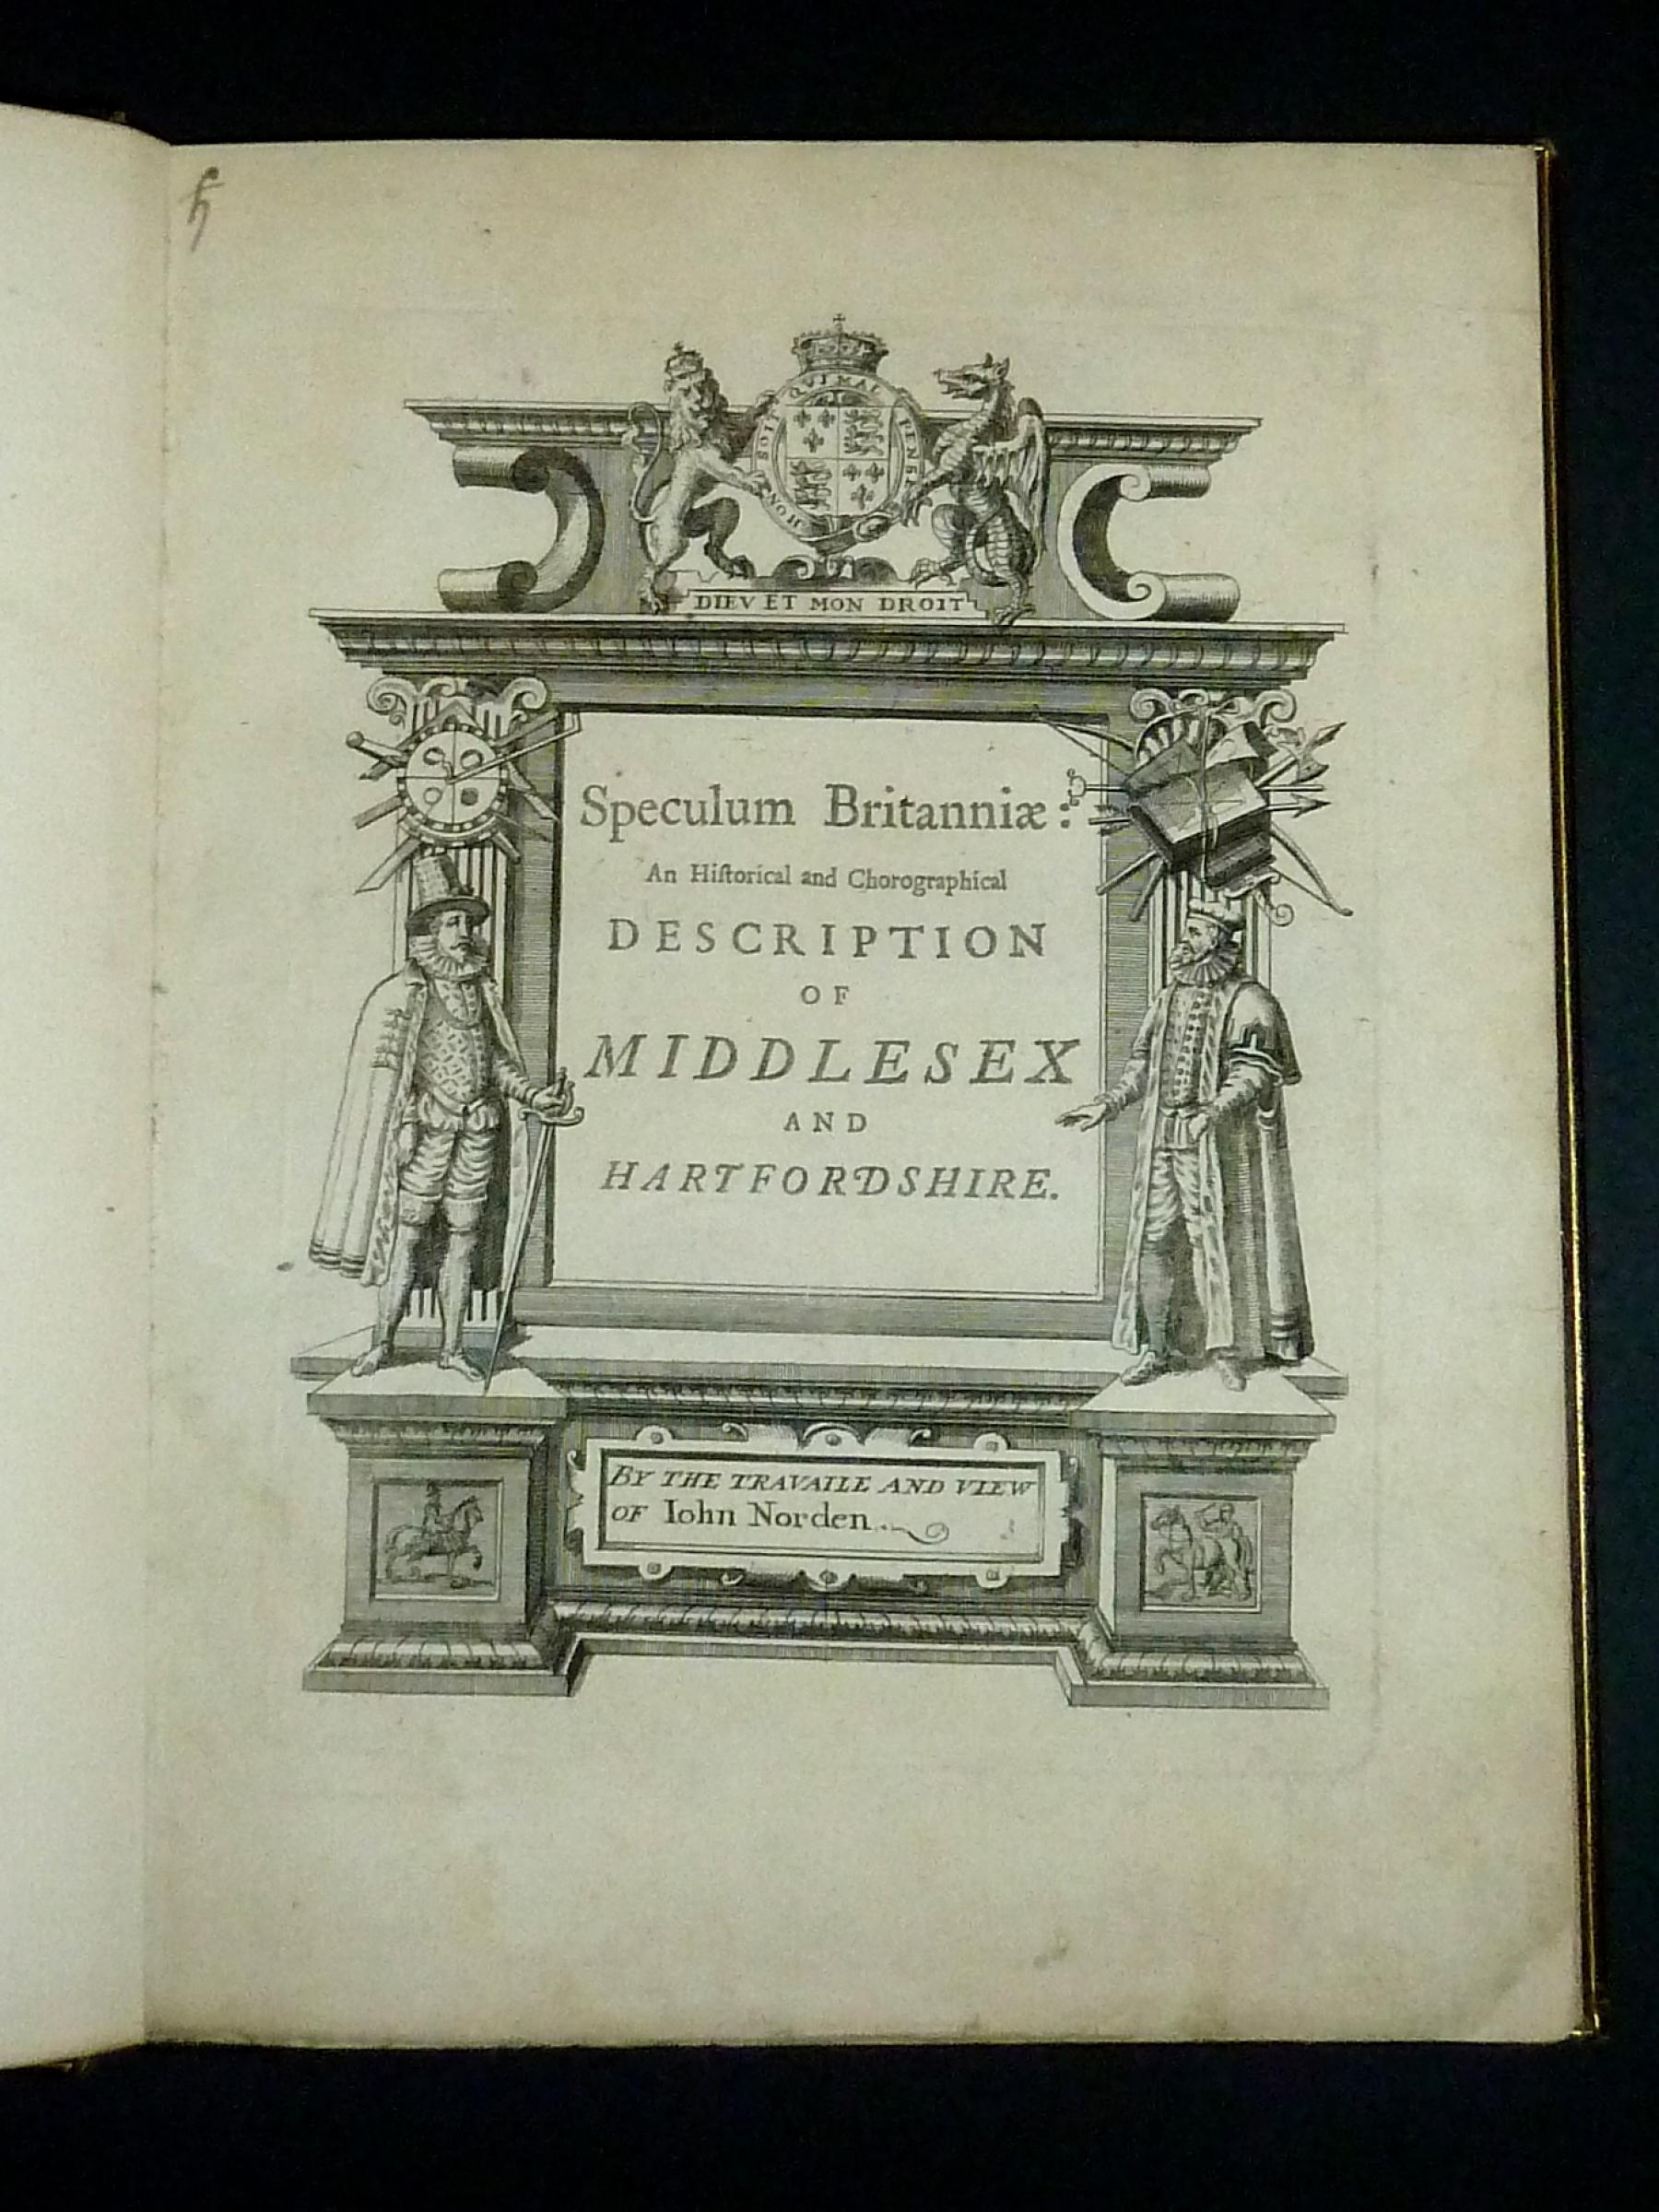 Speculum Britanniae Middlesex & Hertfordshire